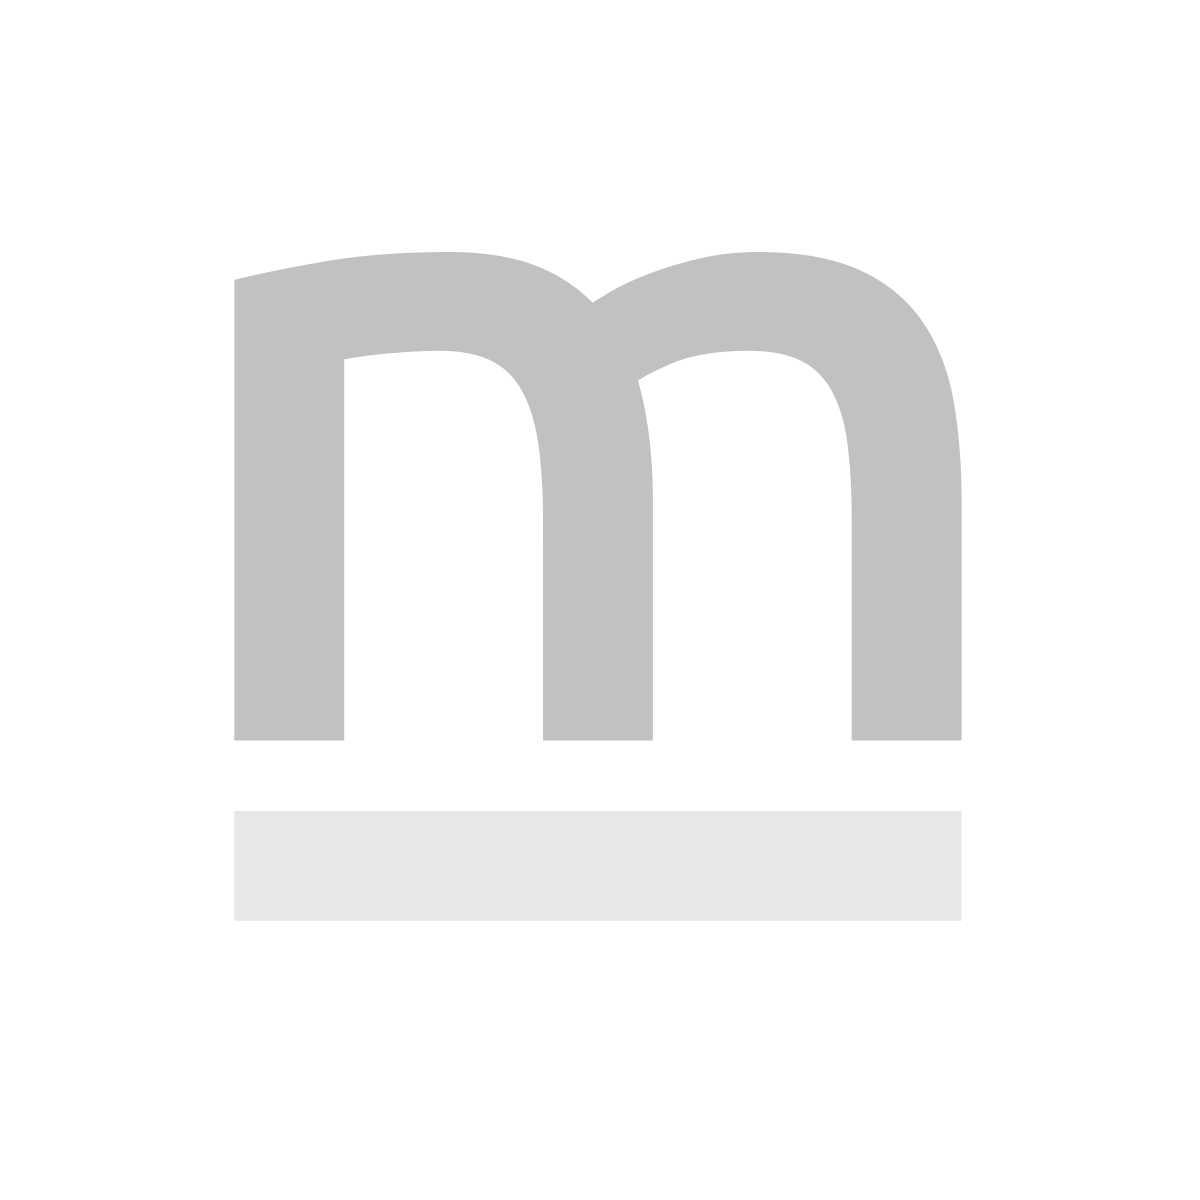 Krzesło CLAUDINE 1 VELVET GOLD żółte